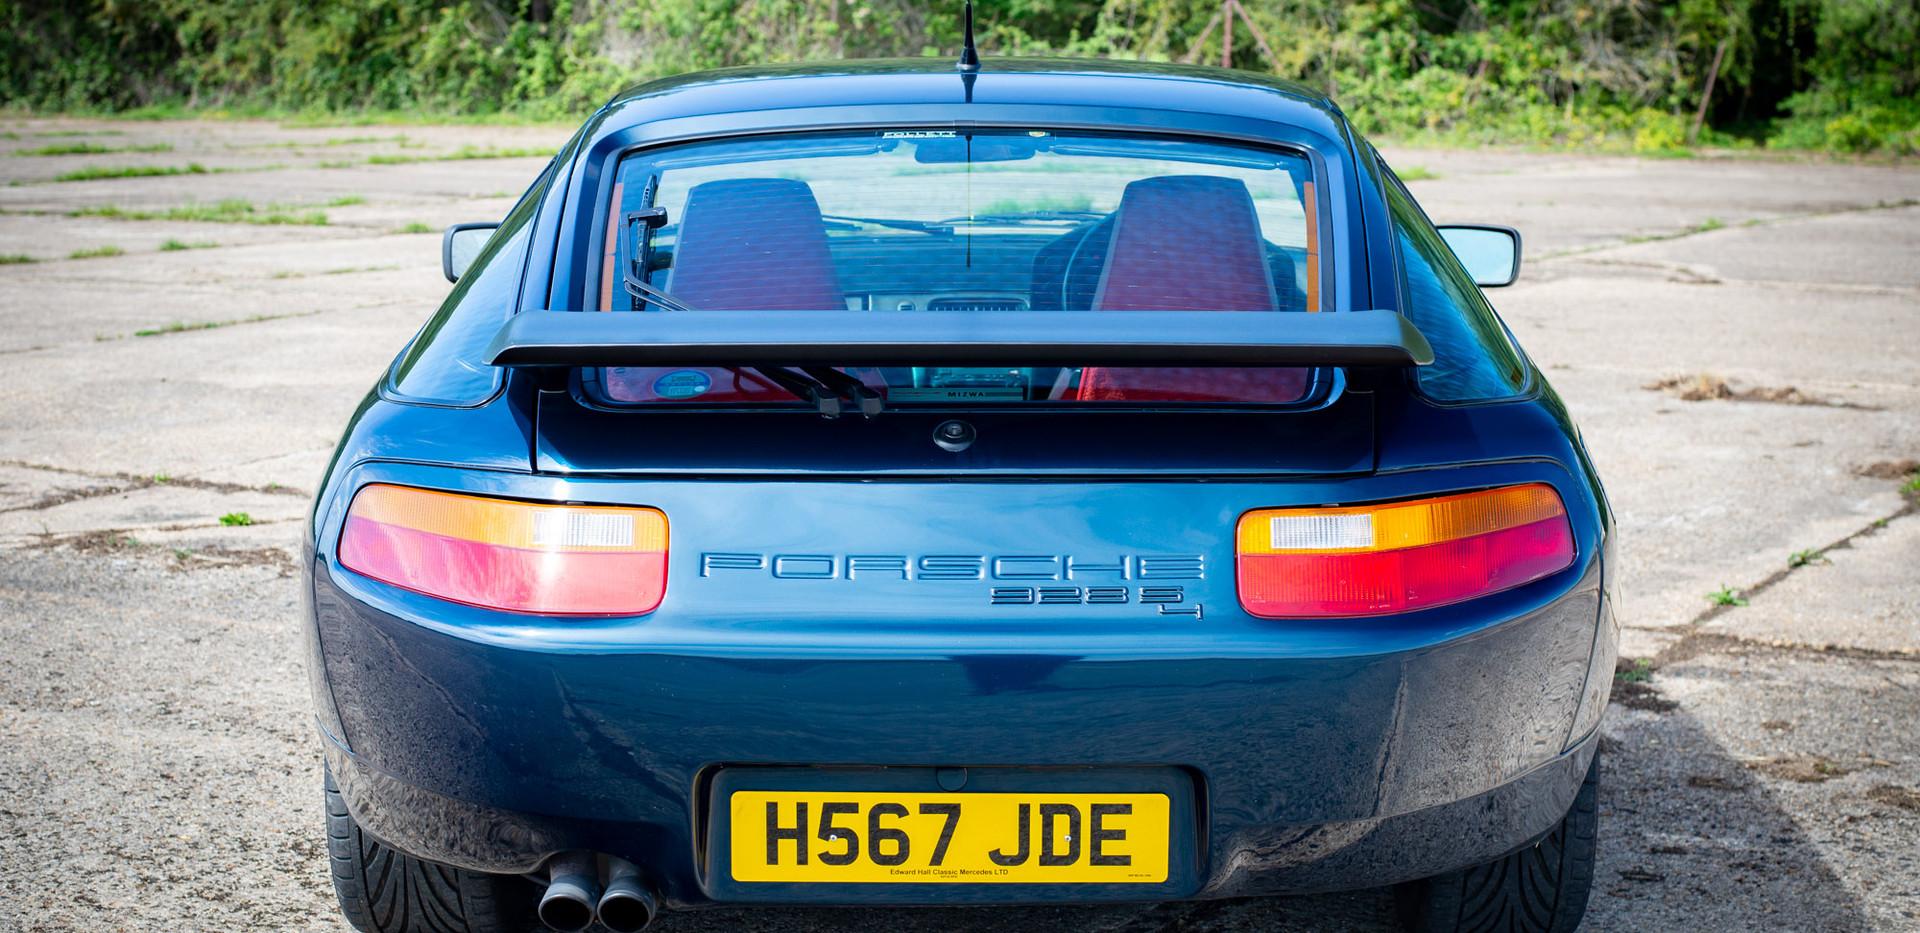 Porsche 928 S4 UPDATE-6.jpg